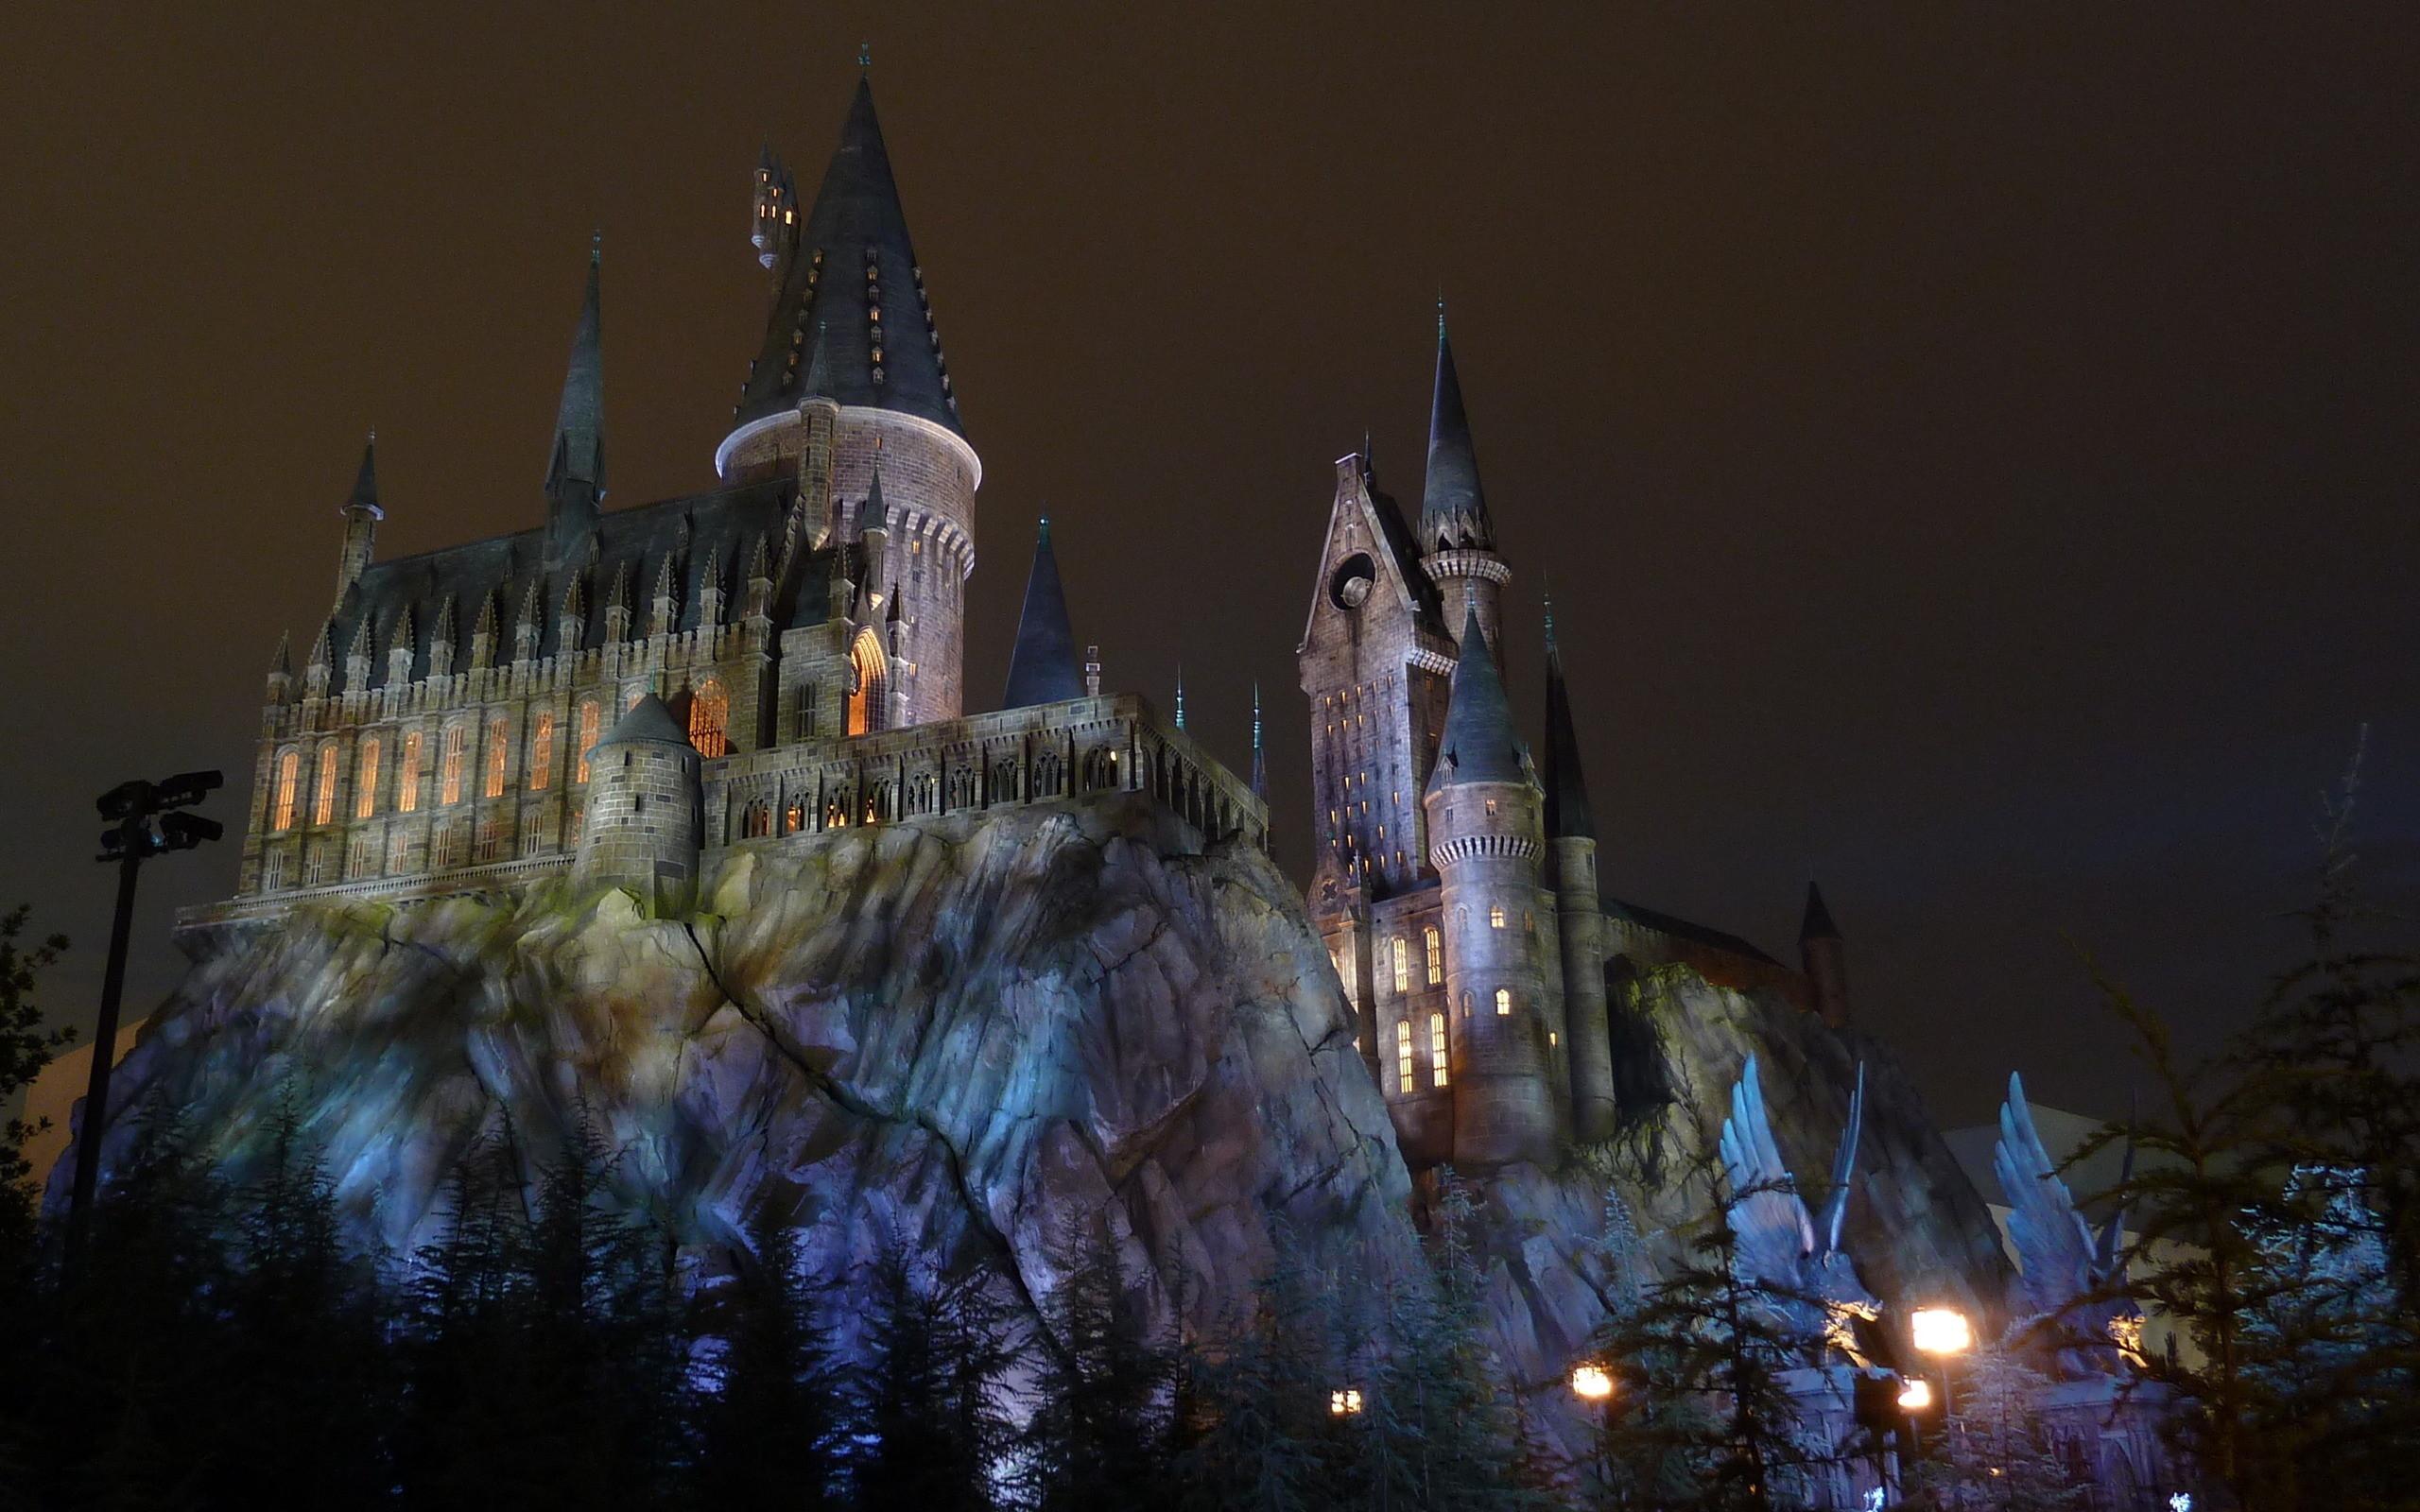 Good Wallpaper Harry Potter Pottermore - 135315  2018_772450.jpg